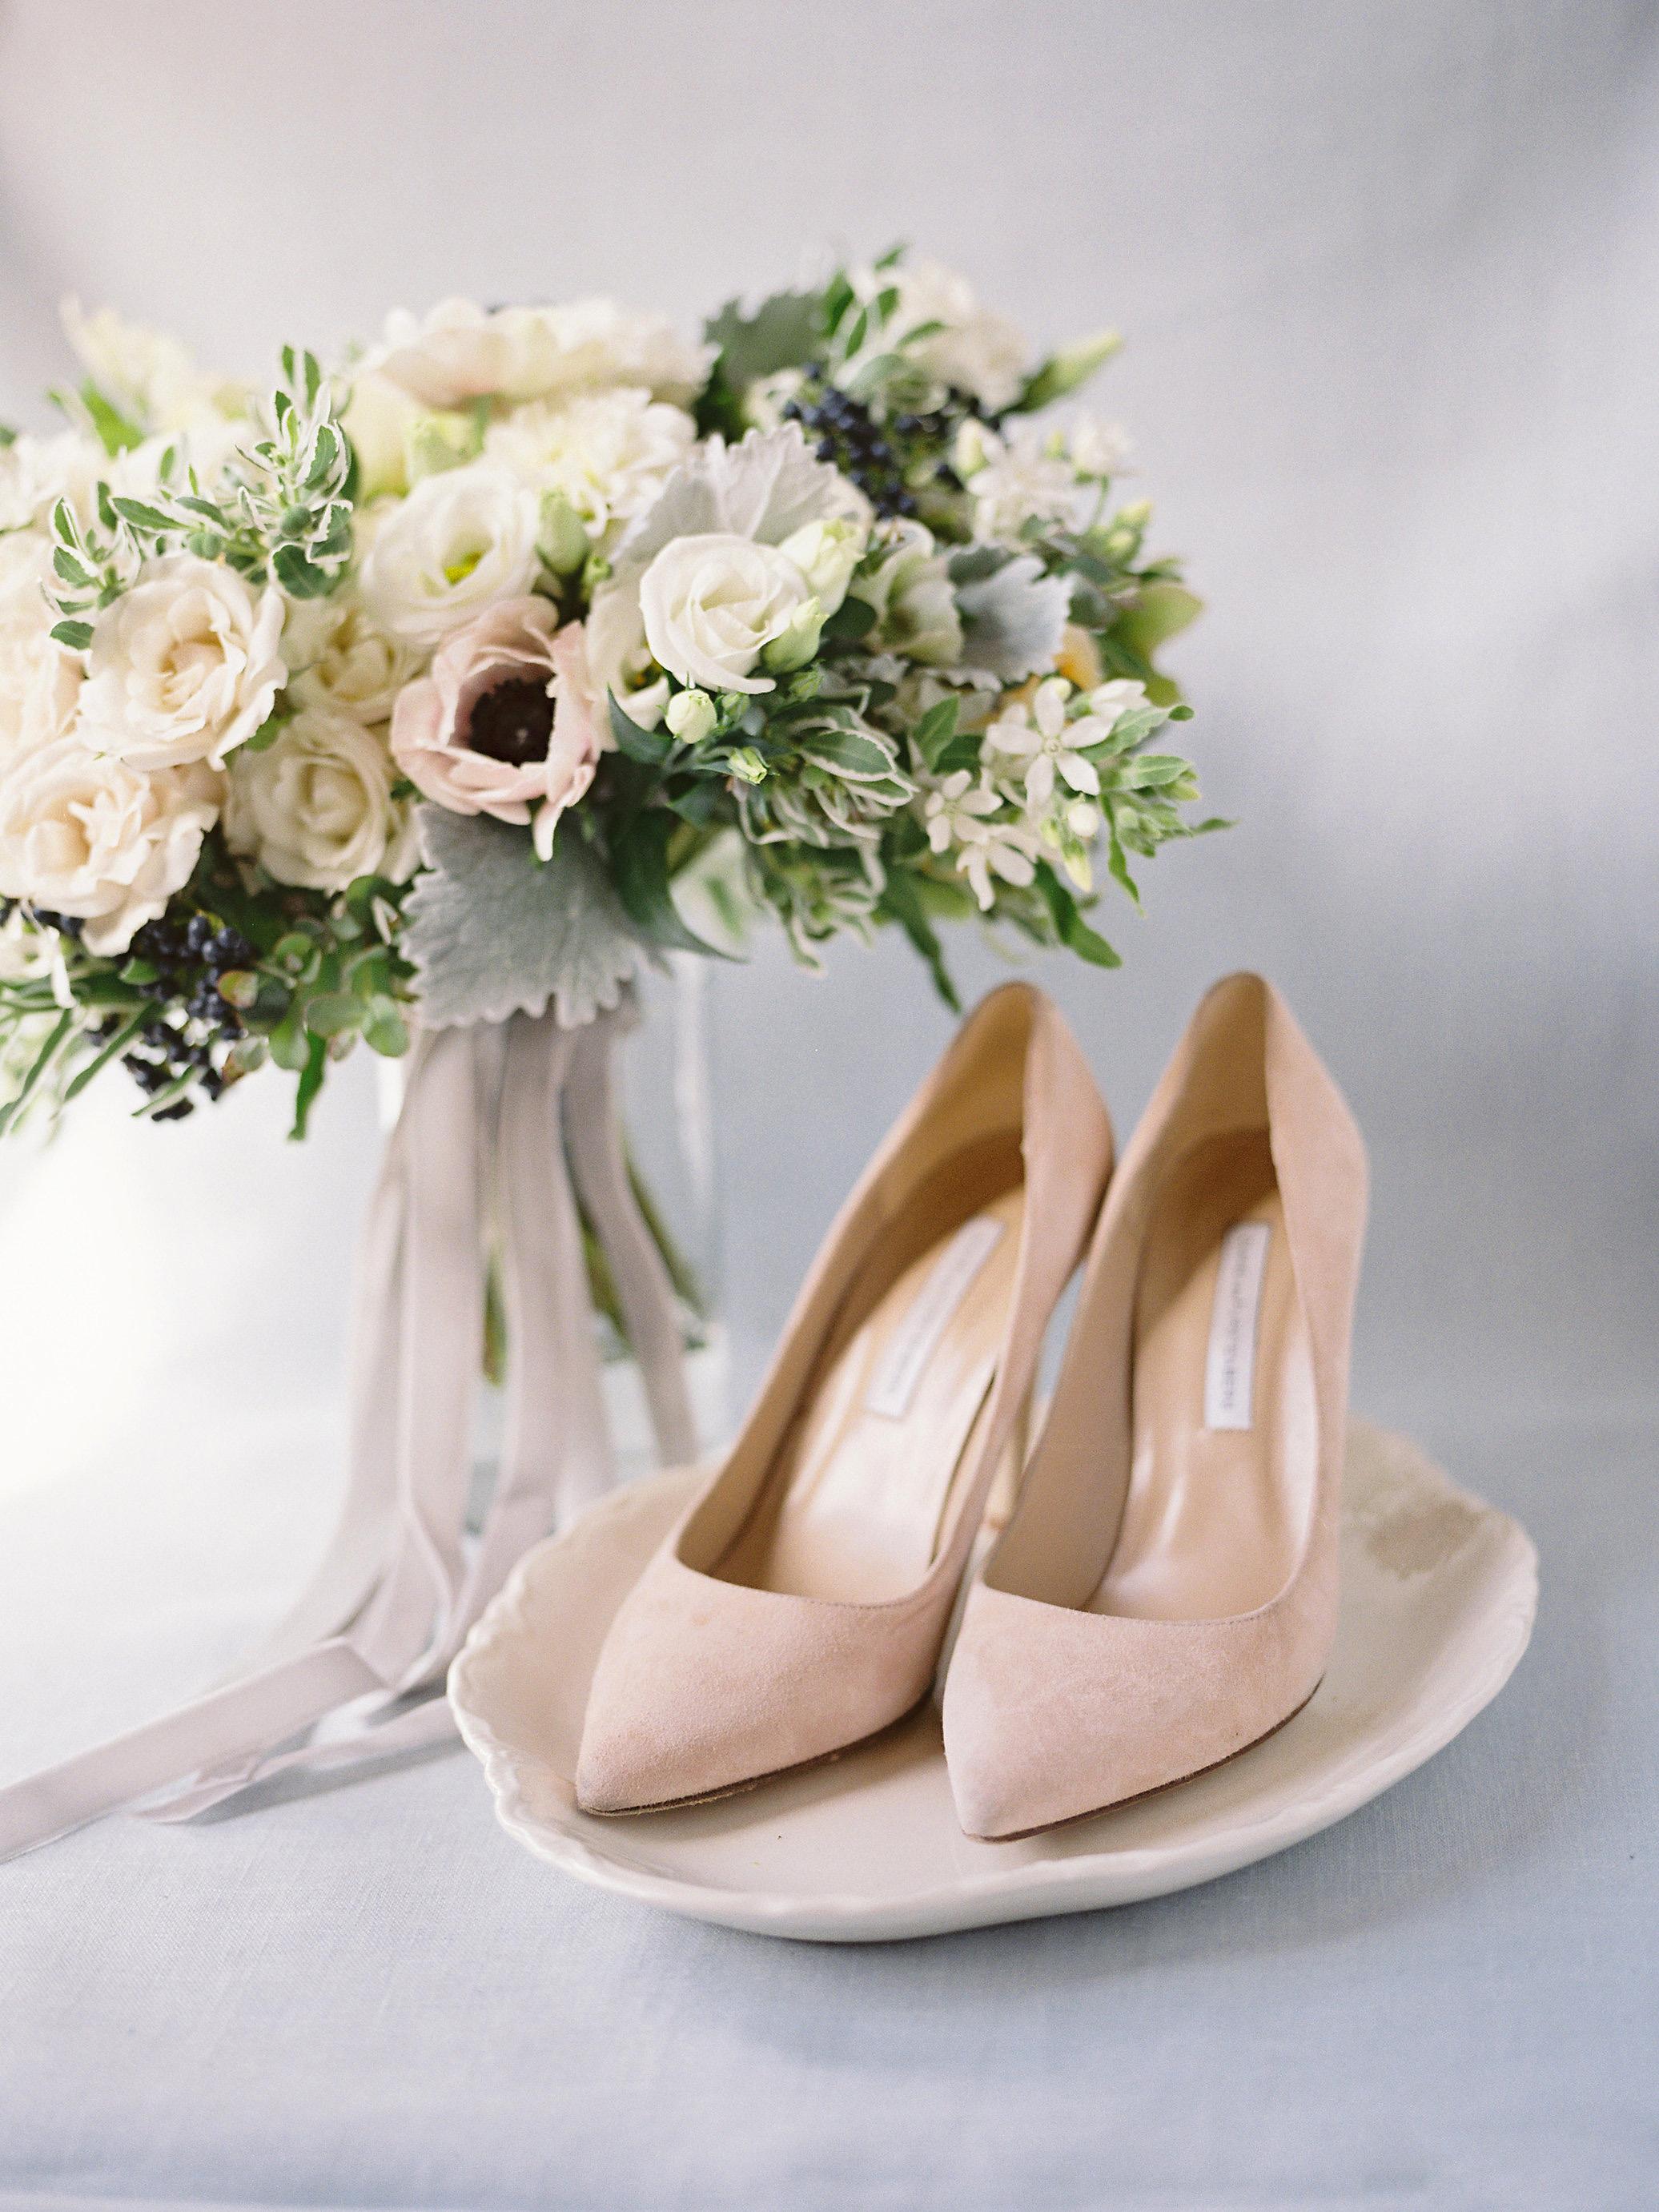 taylor cameron wedding bouquet shoes